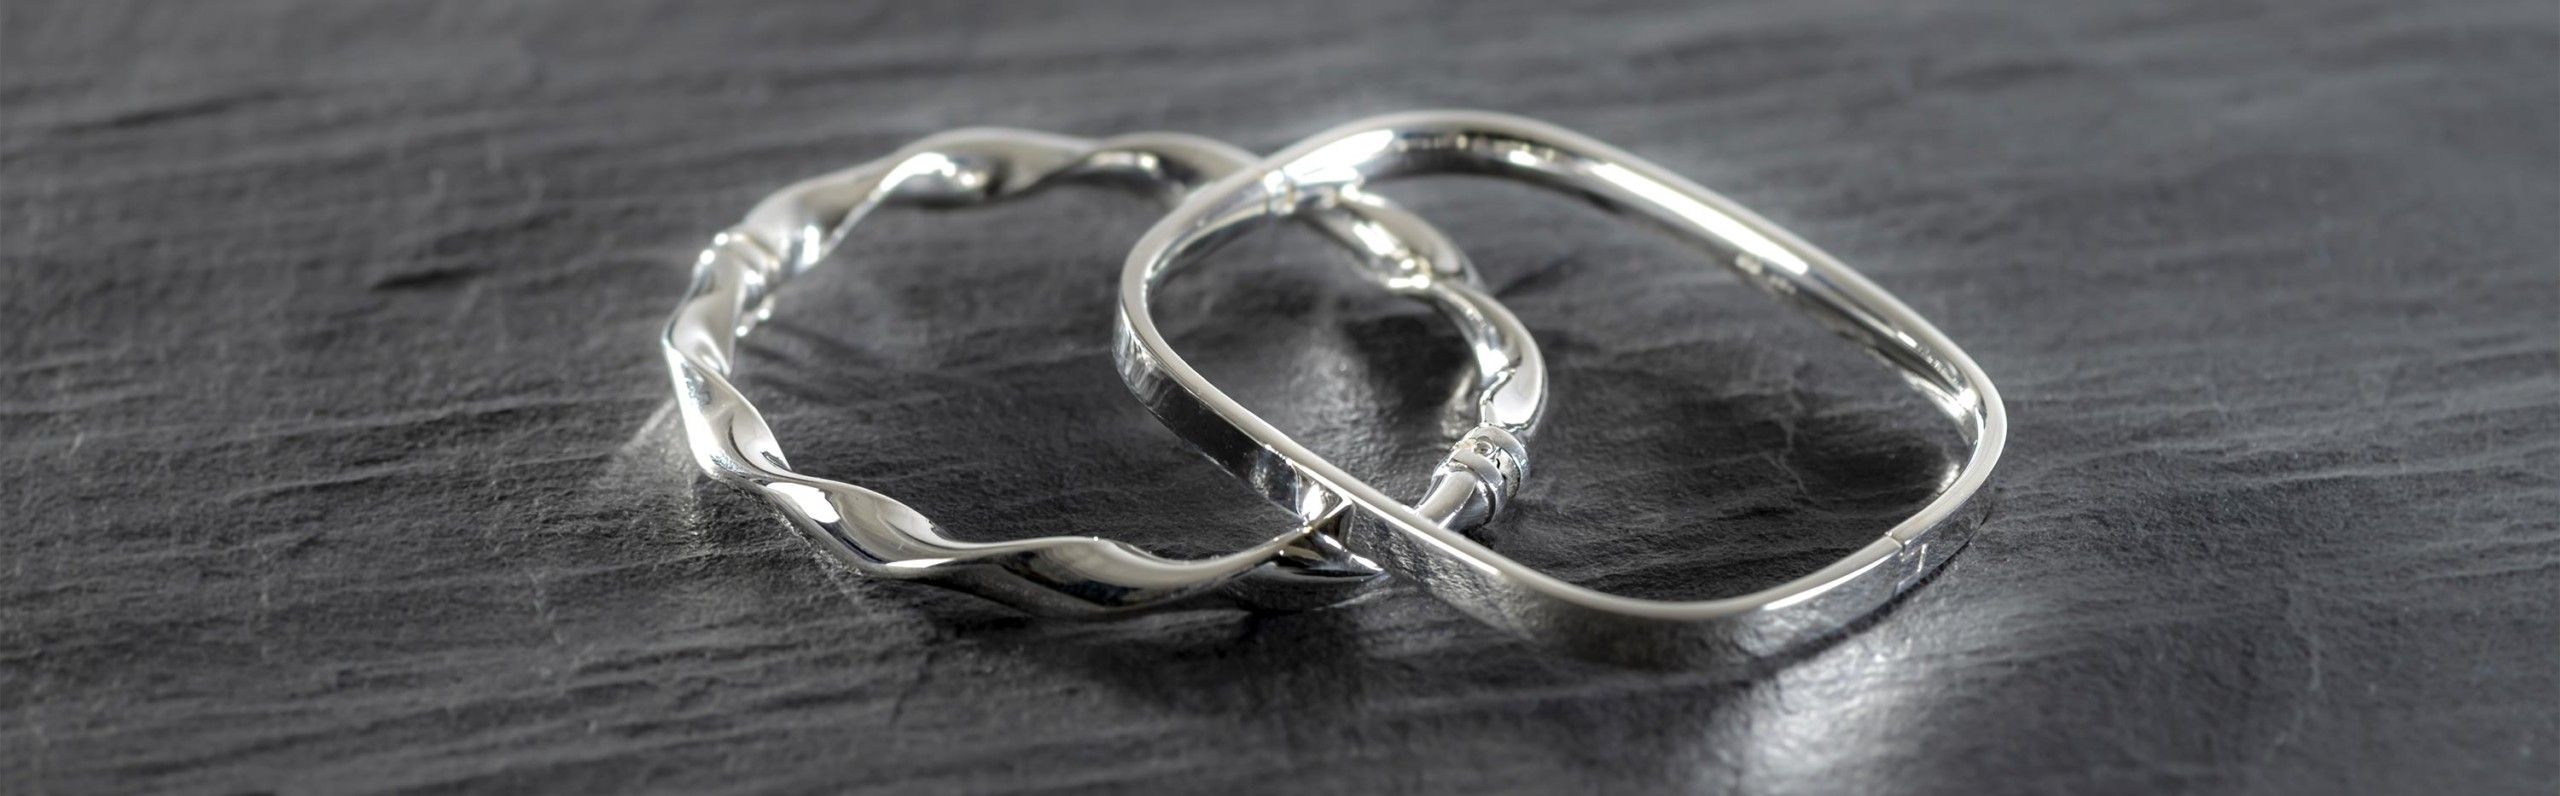 Bangles - Dawes Jewellery Home Page